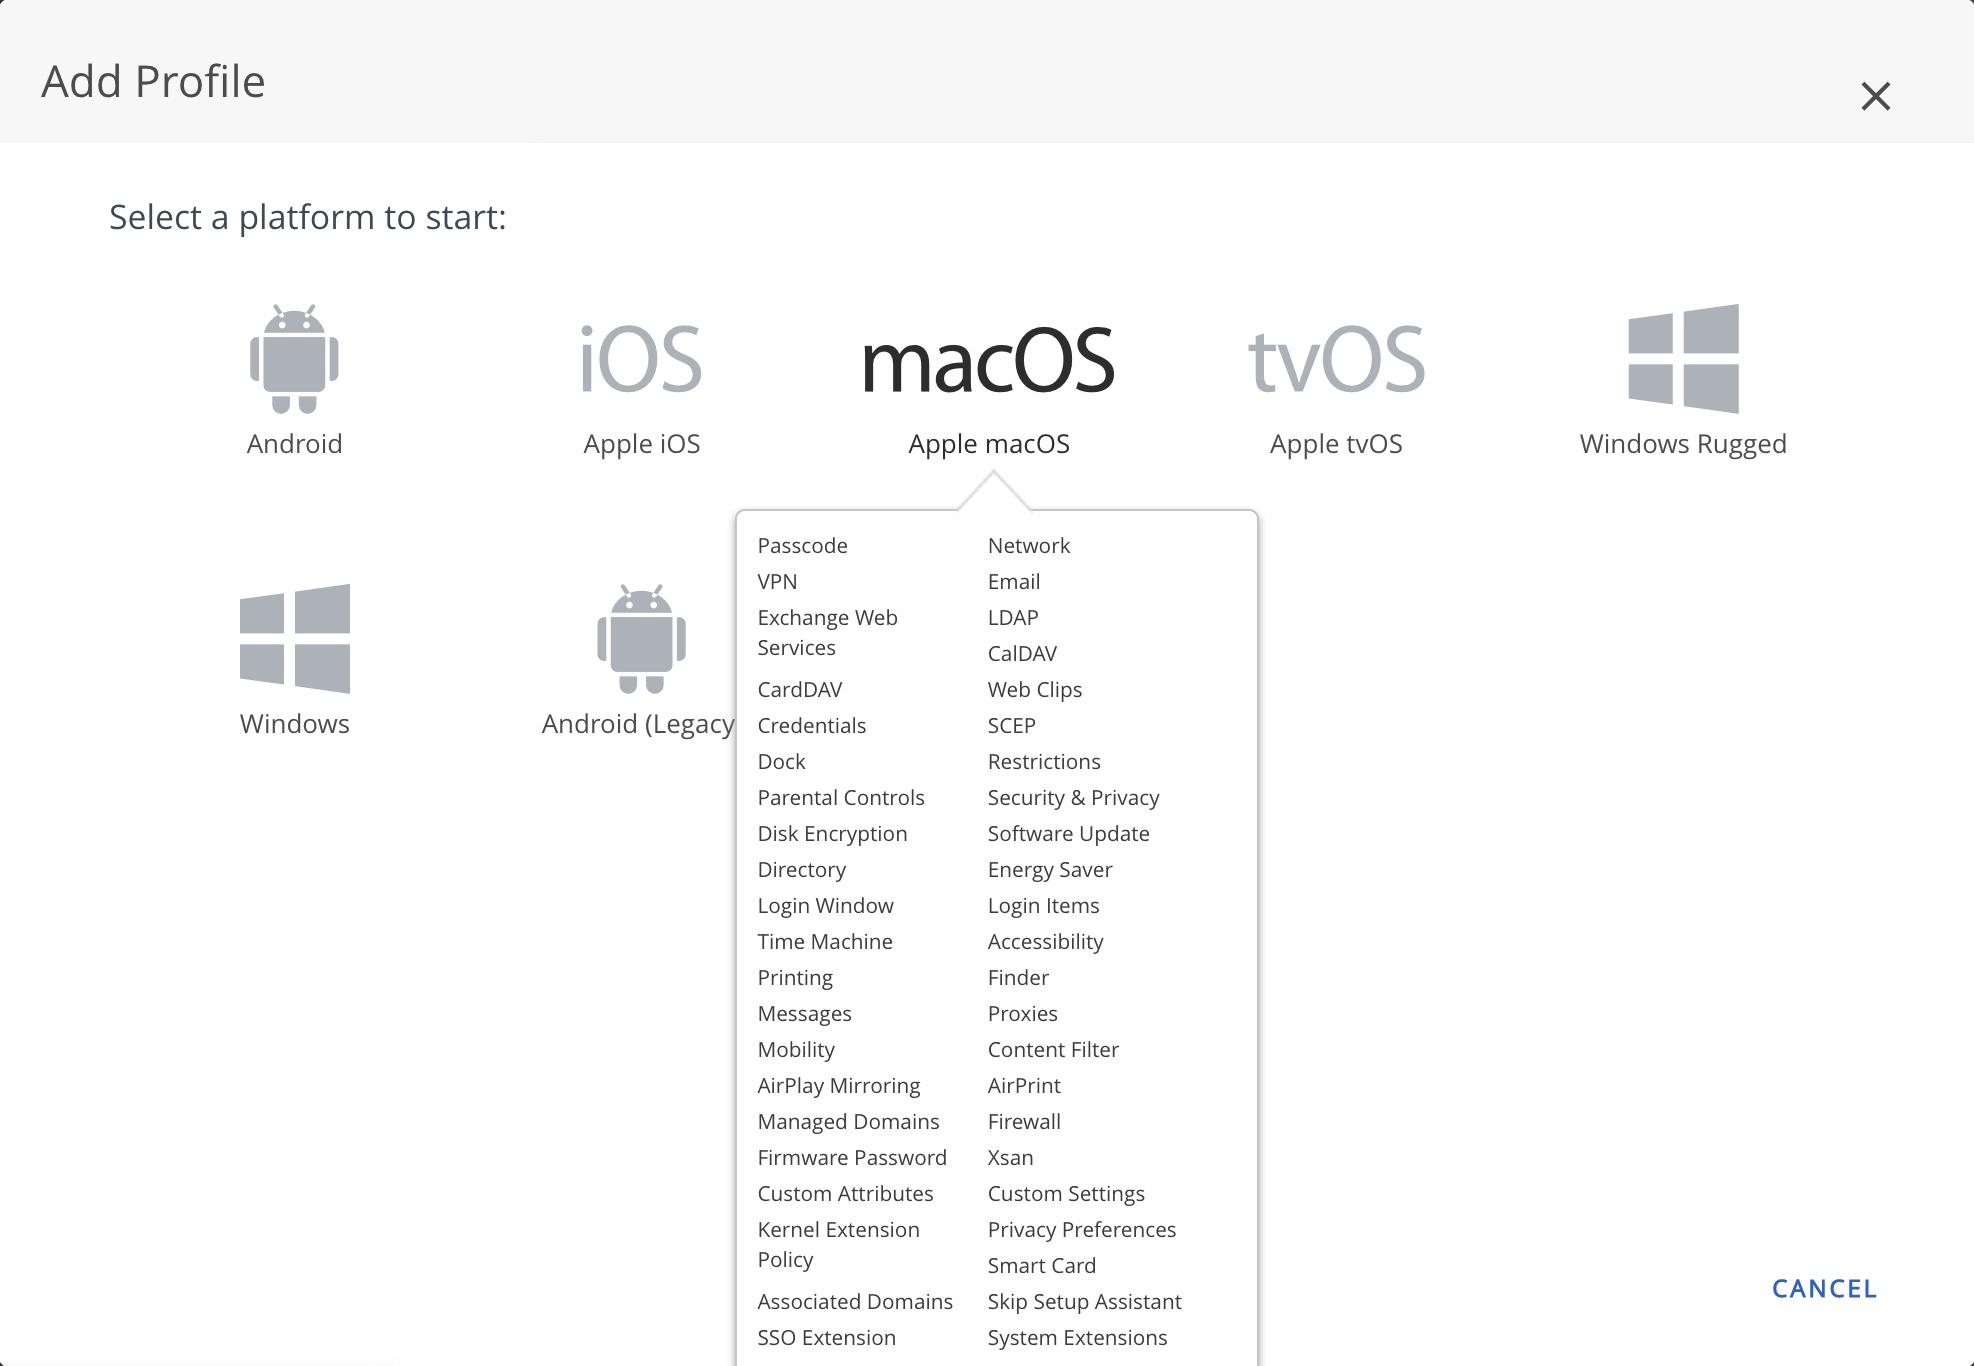 Add macOS Profile